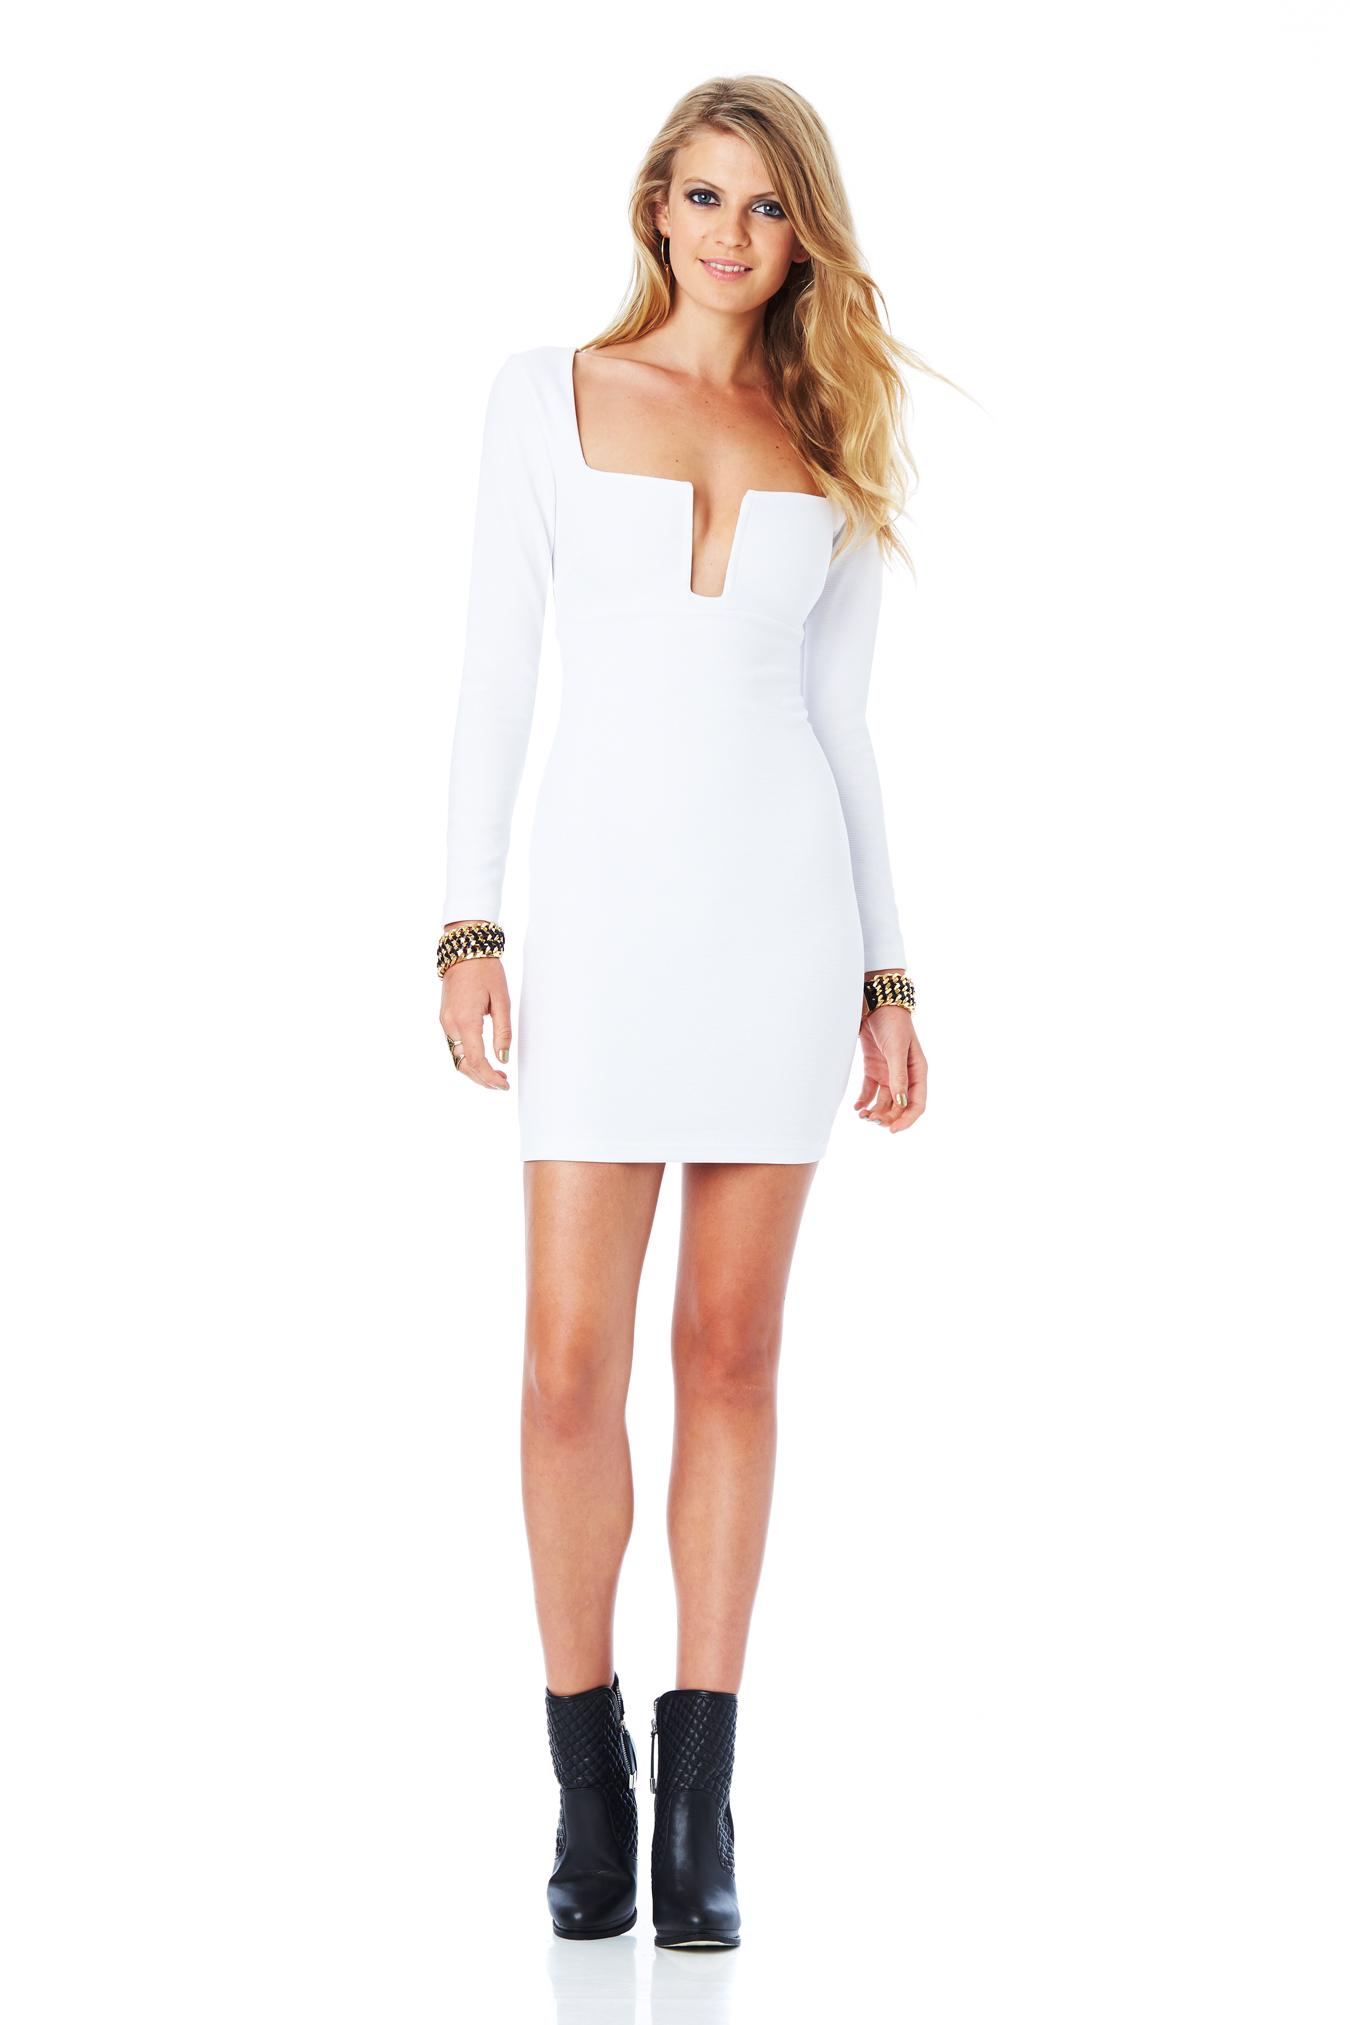 White Stadium Winter Edition : Buy Designer Dresses Online at Nookie